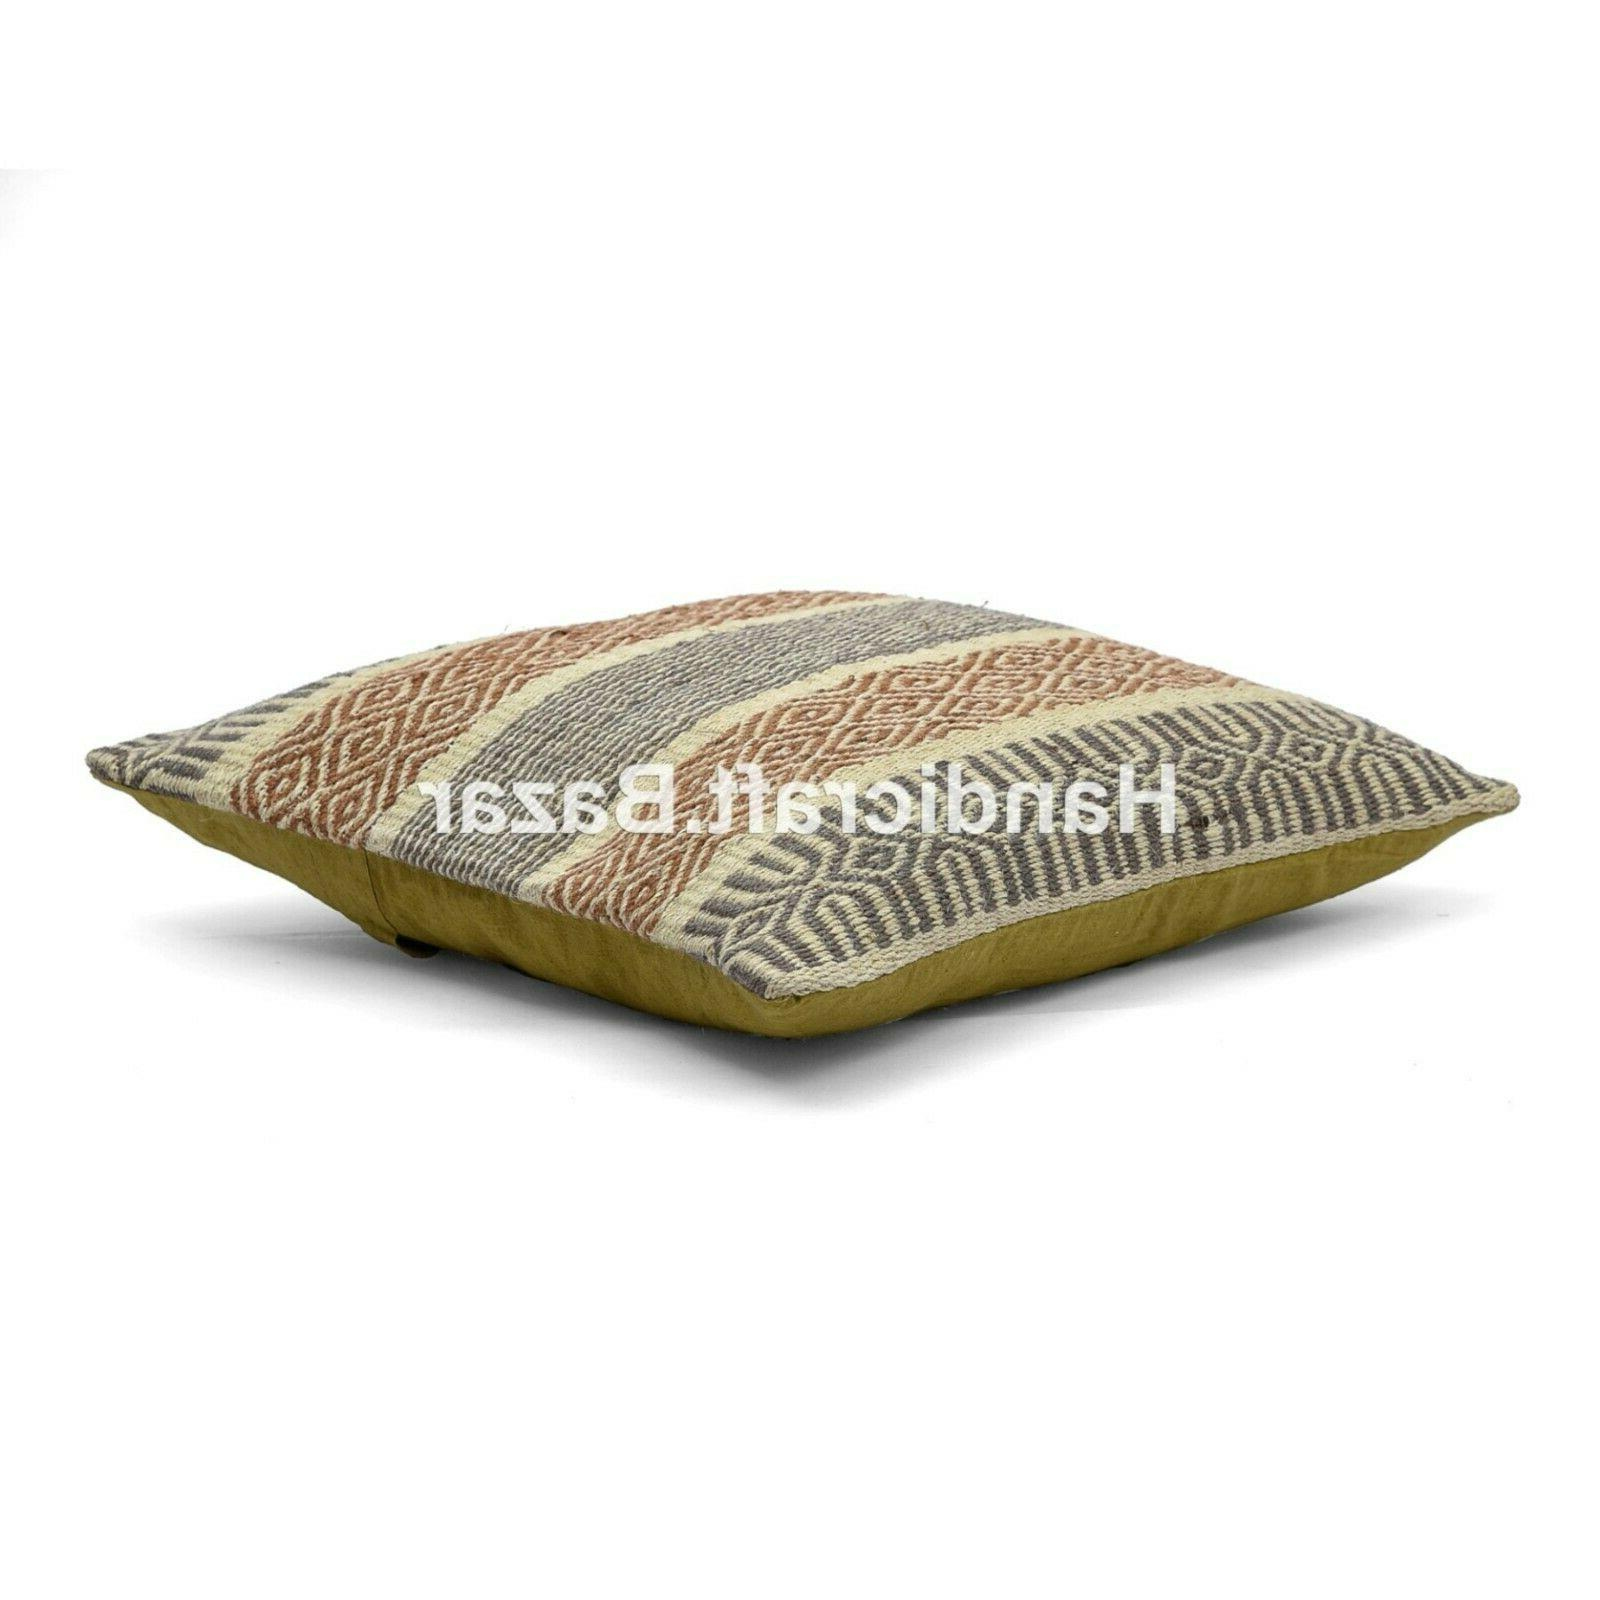 Set 5 Cover Pillow Case Sofa